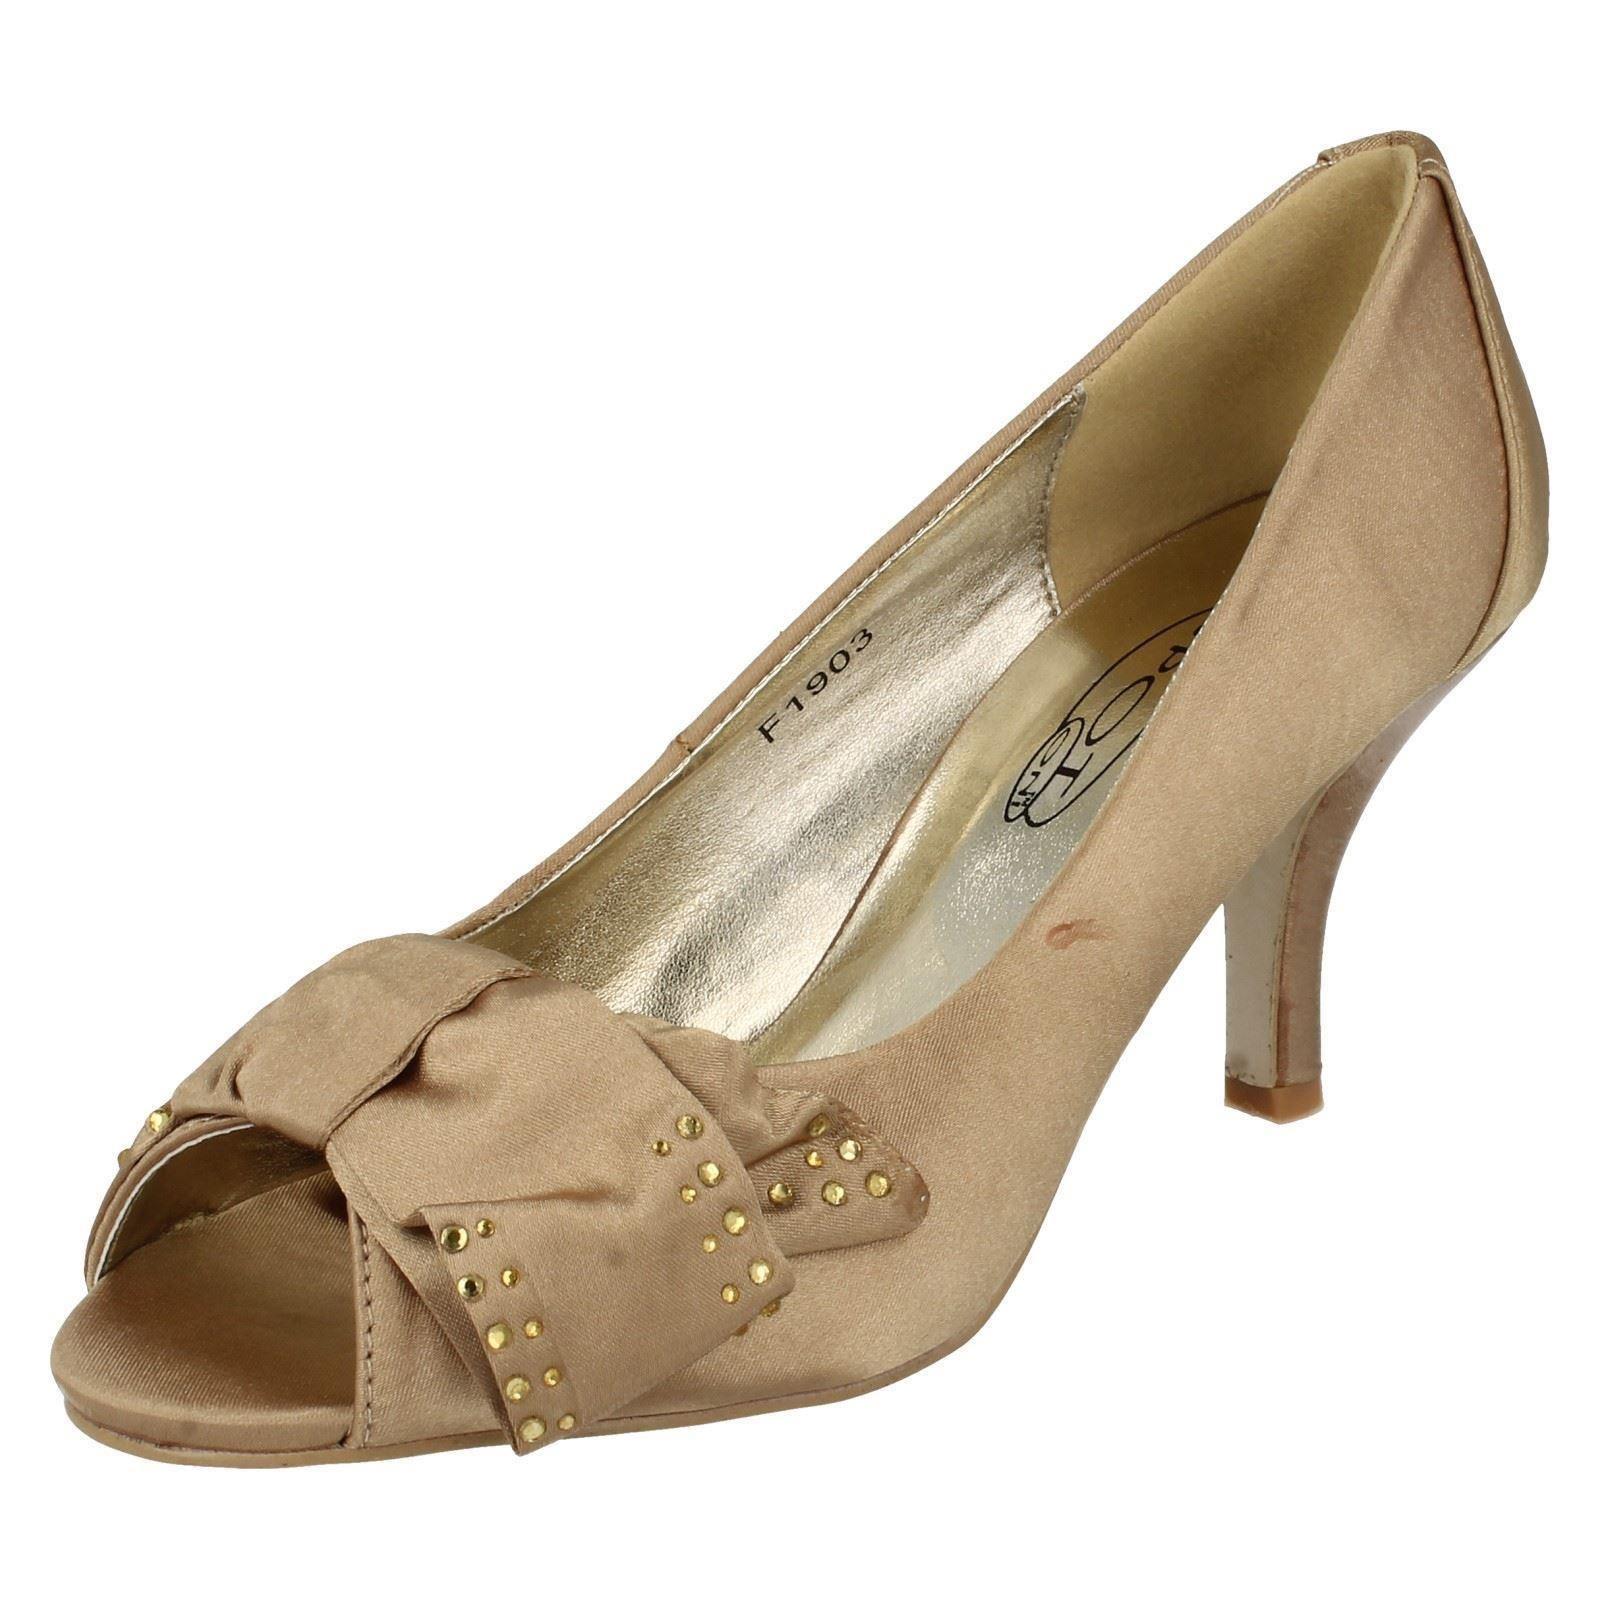 Damas Spot On Puntera Abierta Con Detalle De Moño Diamante Court Shoe